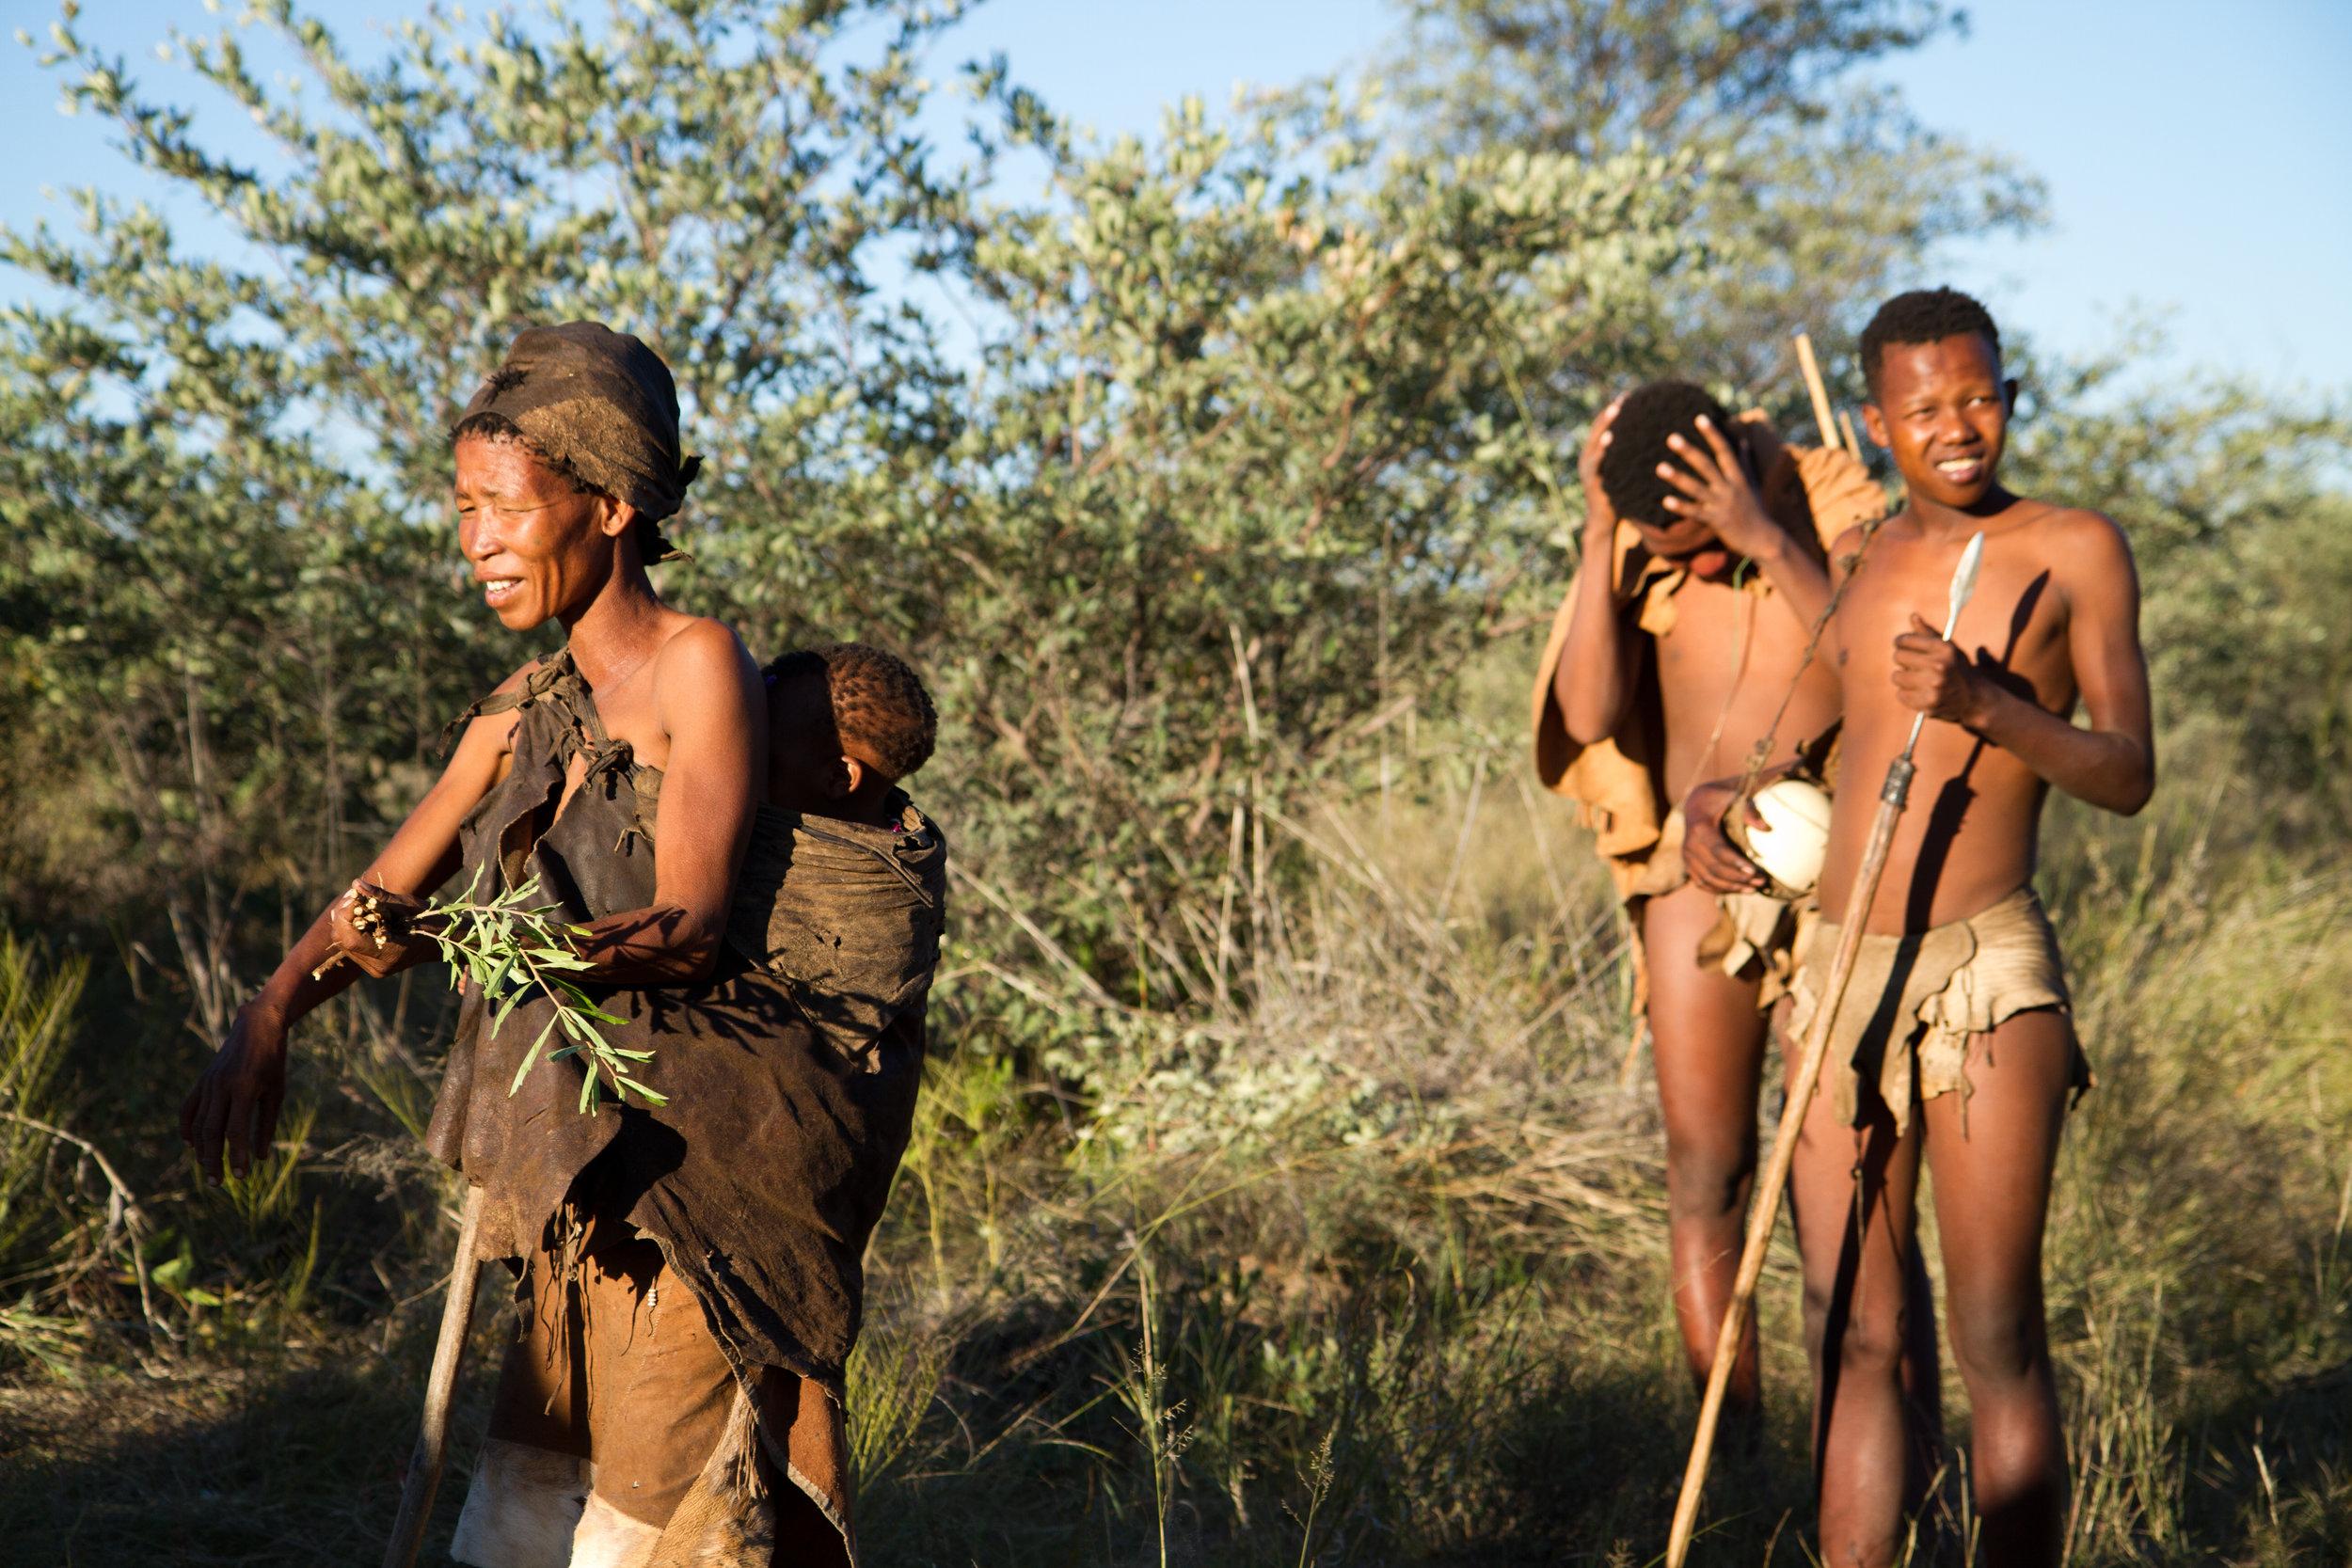 GHANZI, BOTSWANA - MAY 14:  San bushman show people how they gather food in the Kalahari desert in botswana may 14, 2017 in Ghanzi, Botswana - Image